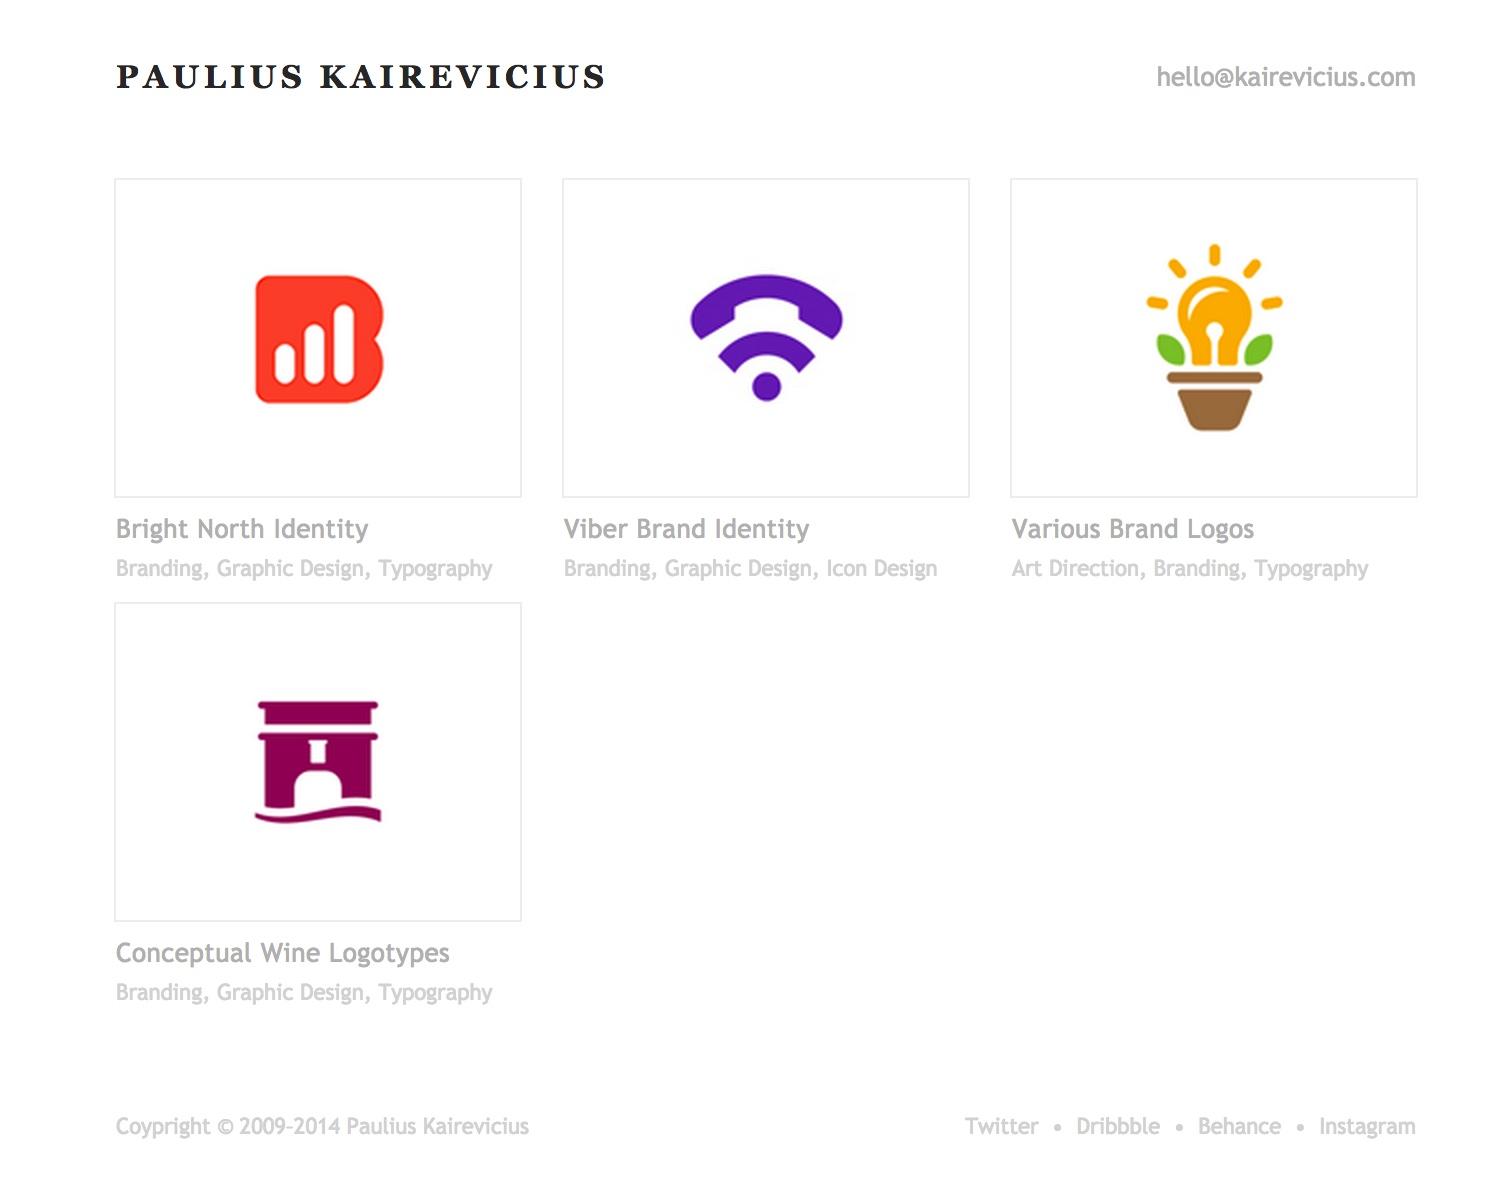 Paulius Kairevicius의 포토폴리오 사이트